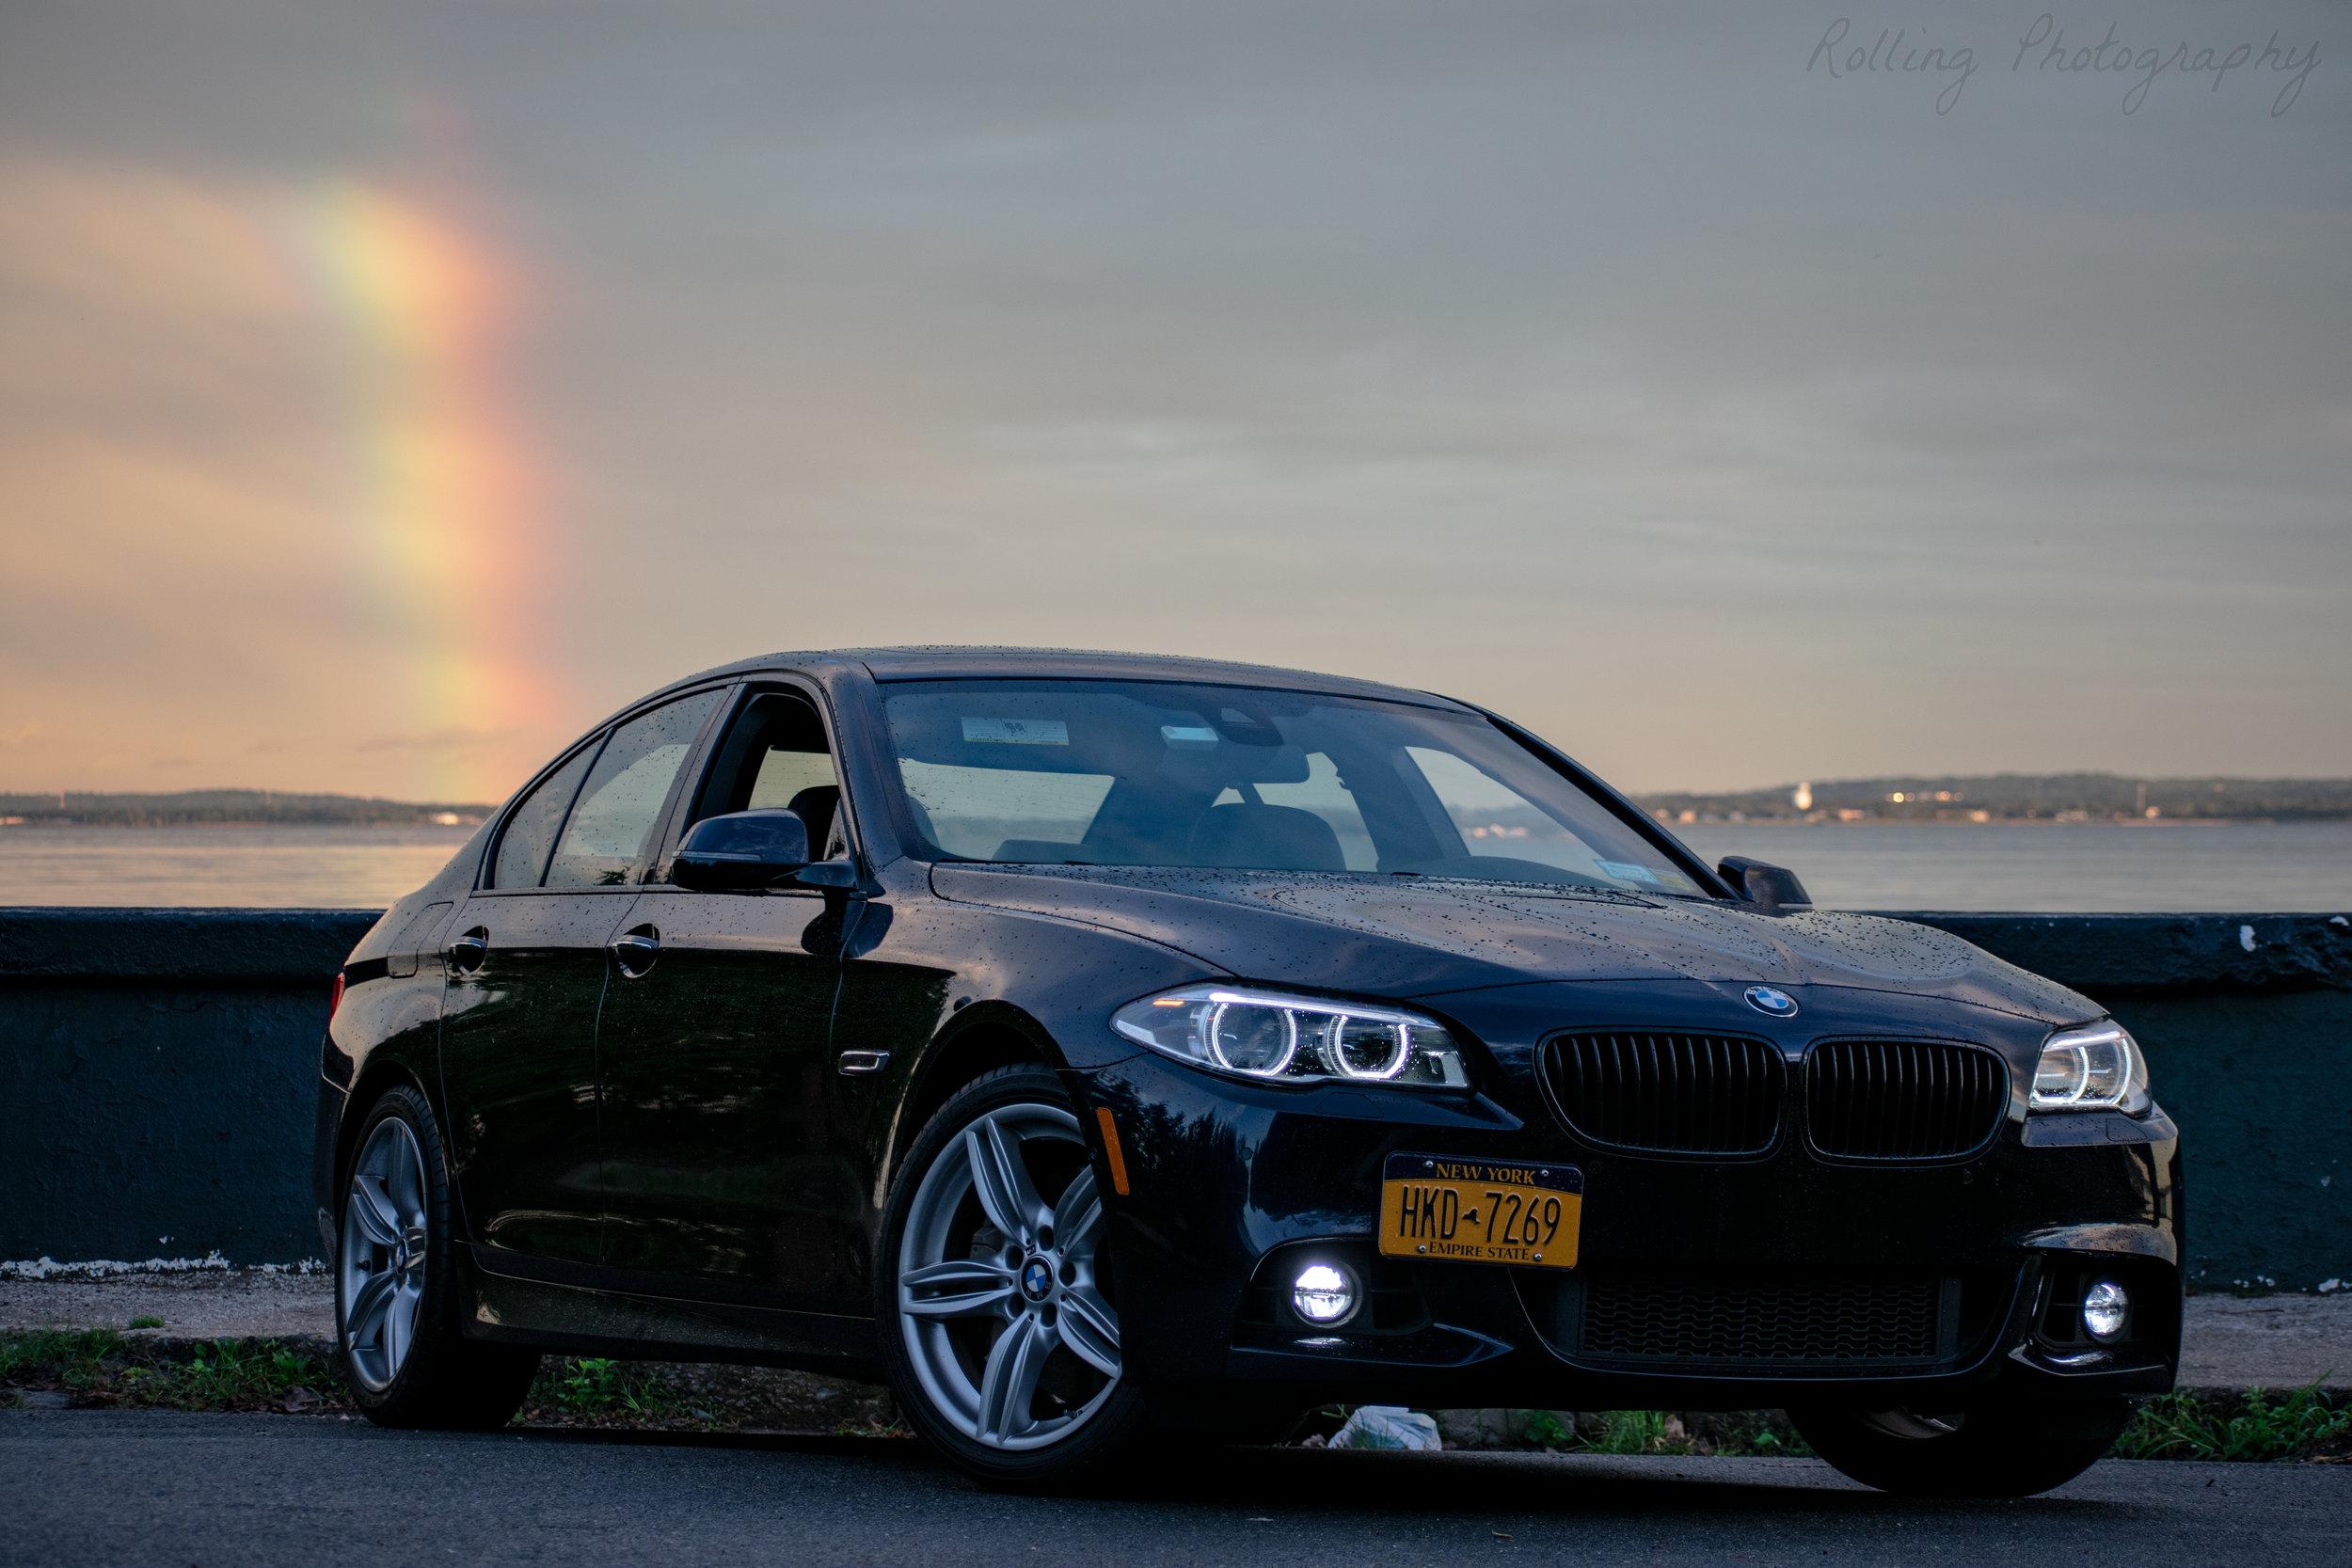 F10 550i Front profile Rainbow.jpg